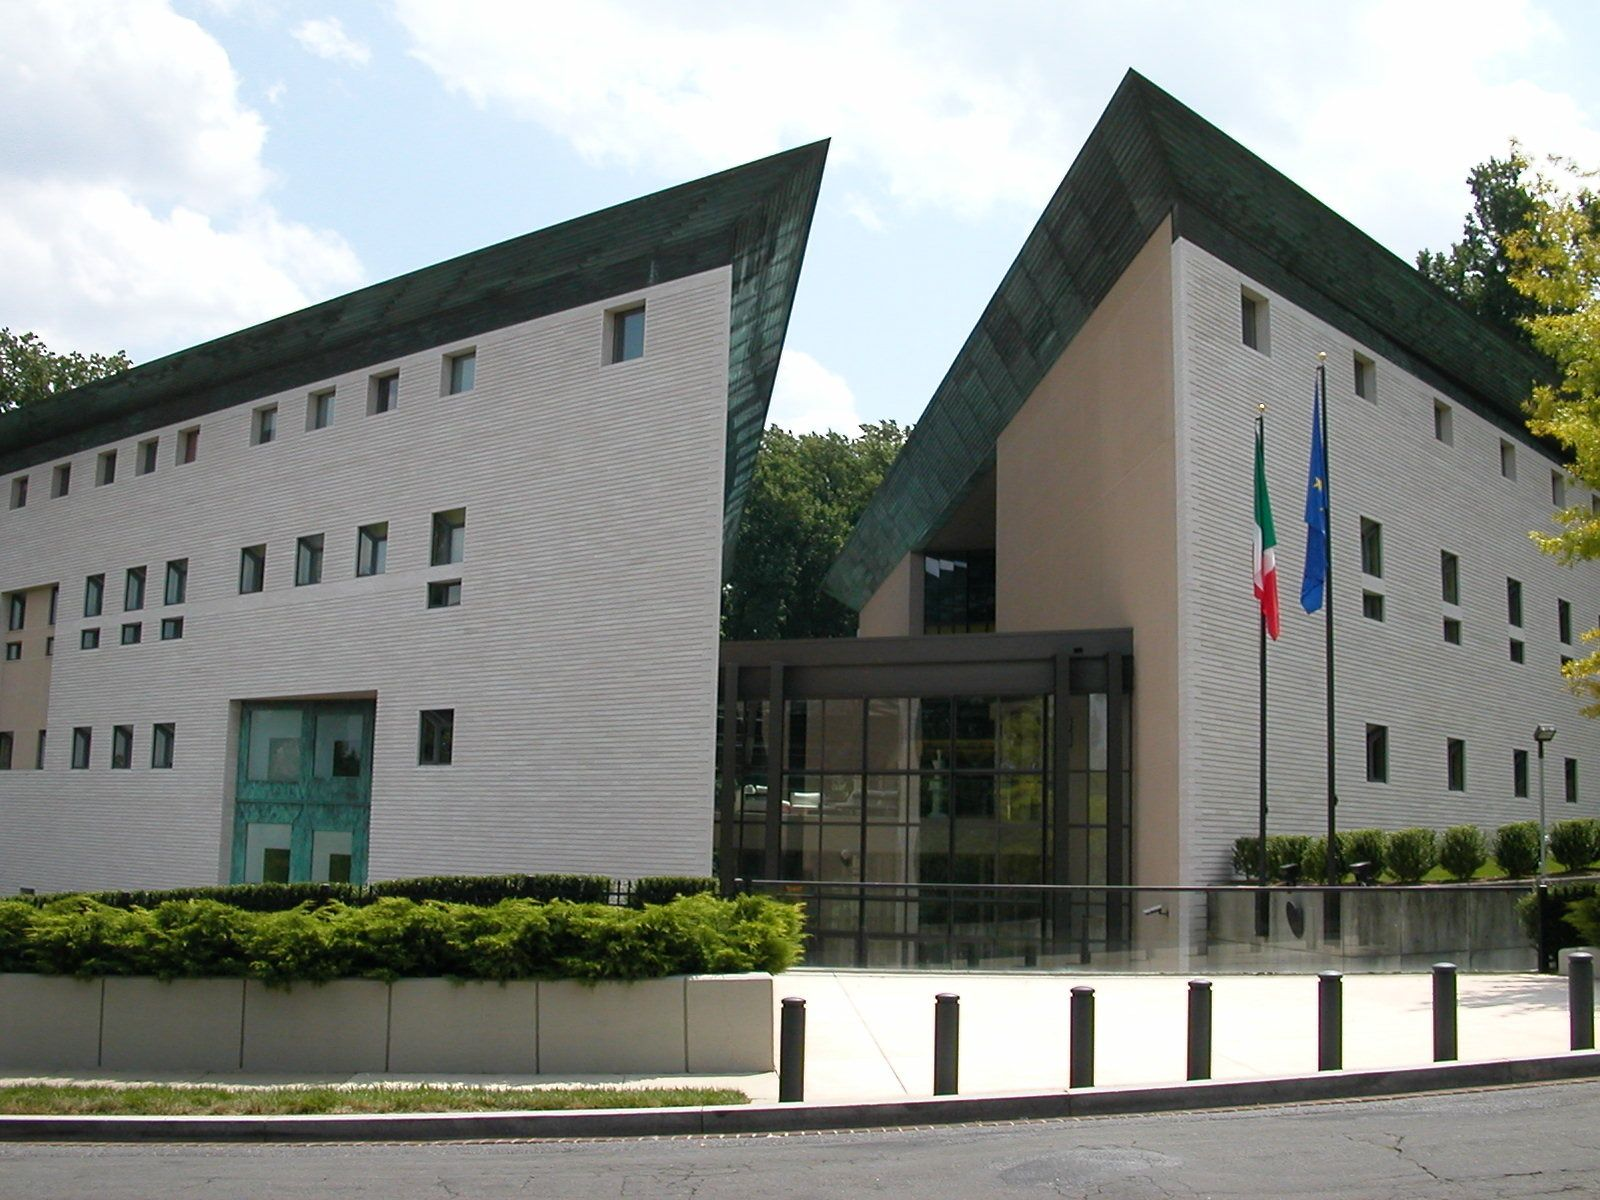 Italy's embassy in D.C.